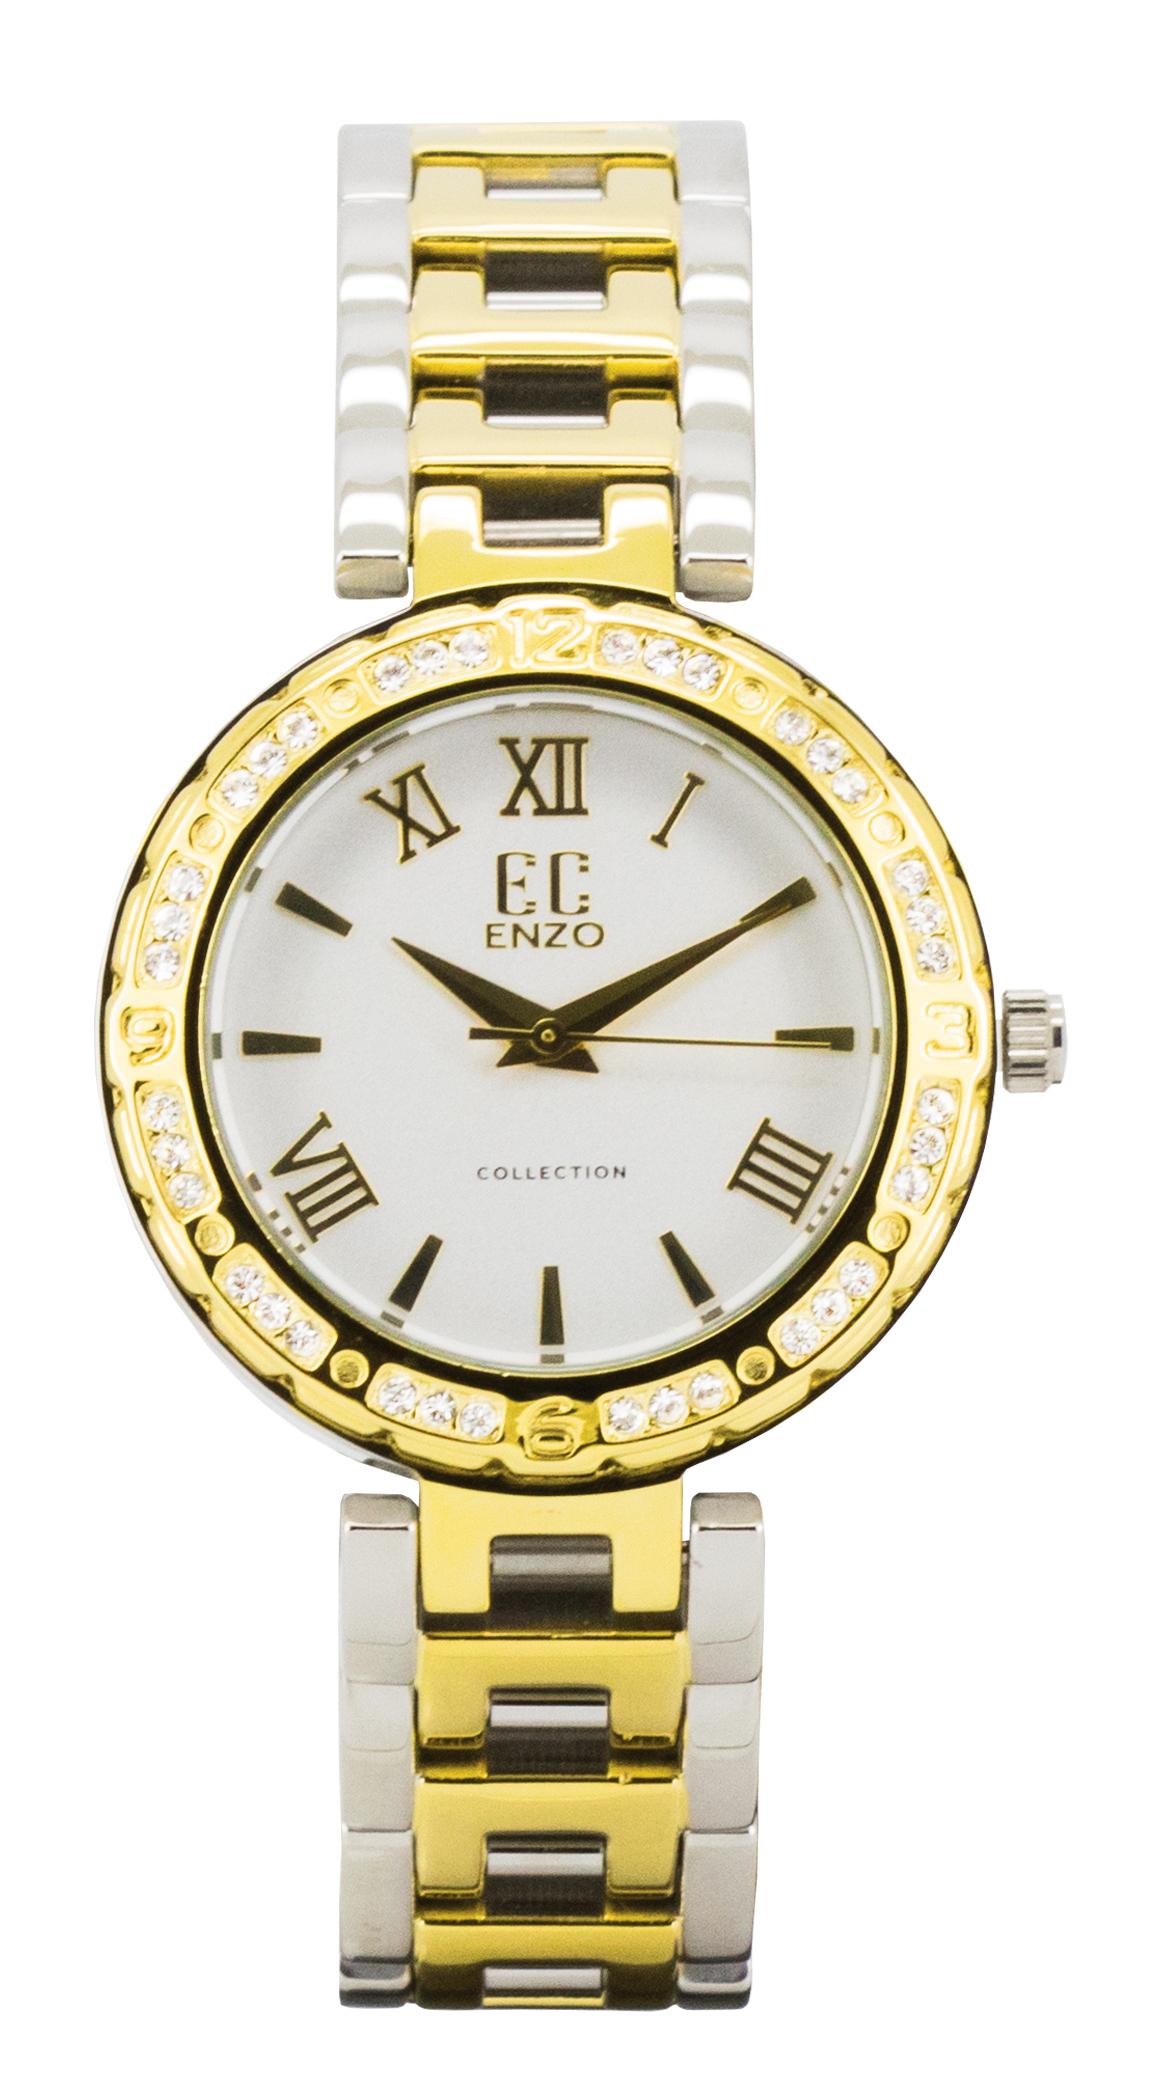 EC#0175# – Enzo Collection